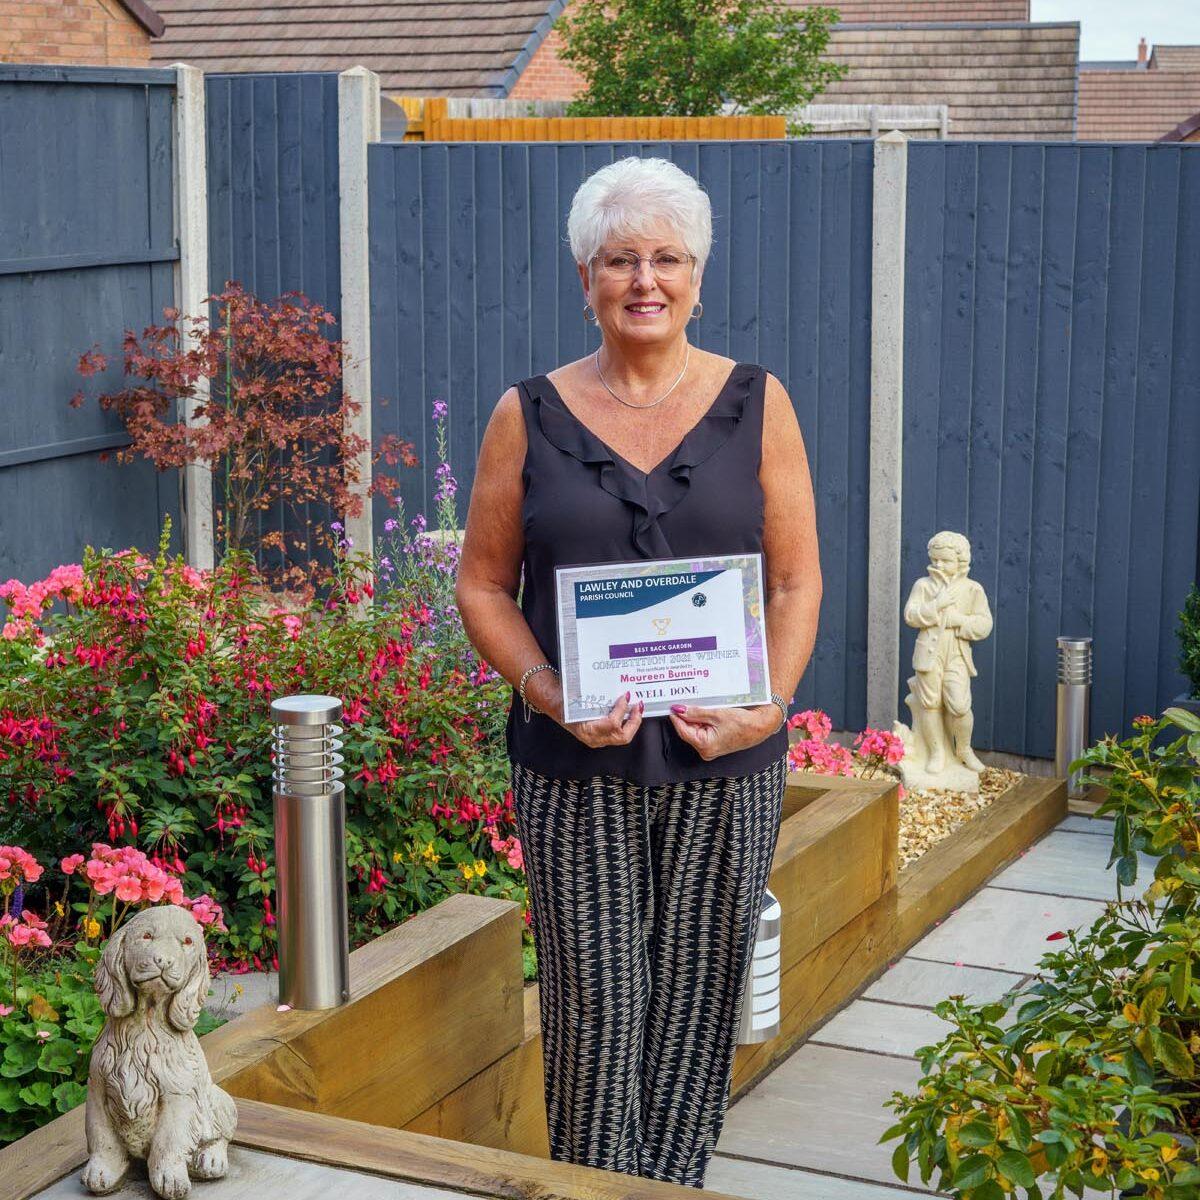 Maureen Bunning standing in her garden, holding a certificate.